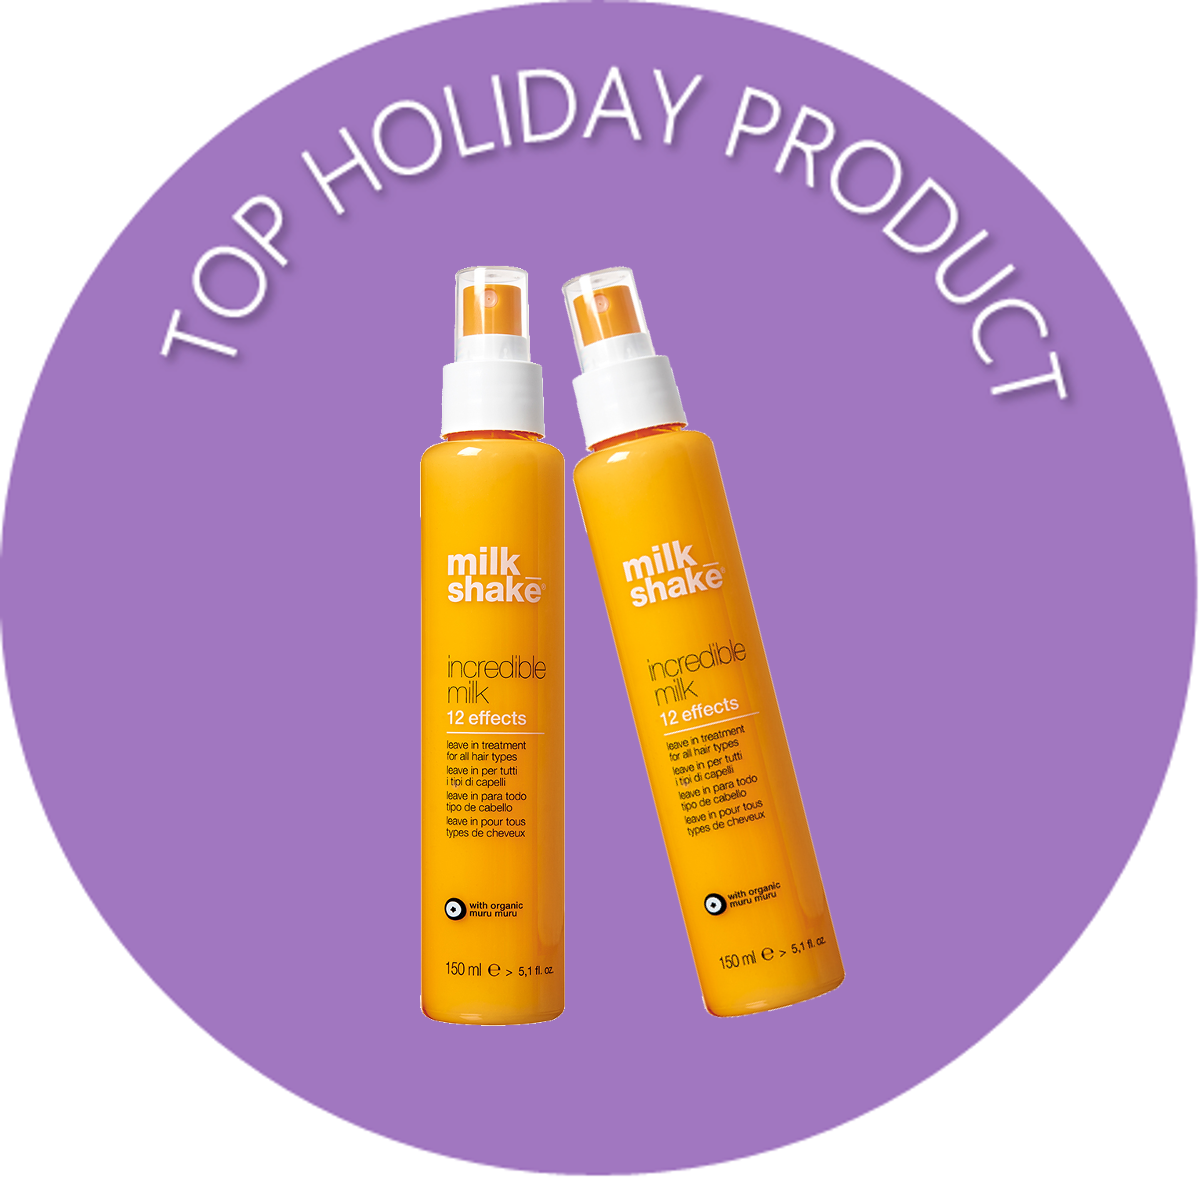 Venus-Beauty-Hair-Tavistock-Devon-Salon-Summer-Holiday-Prep-Hair-Stylist-Beauty-Therapist-Top-Holiday-Product-Milkshake-Incredible-Milk-12-Effects.png